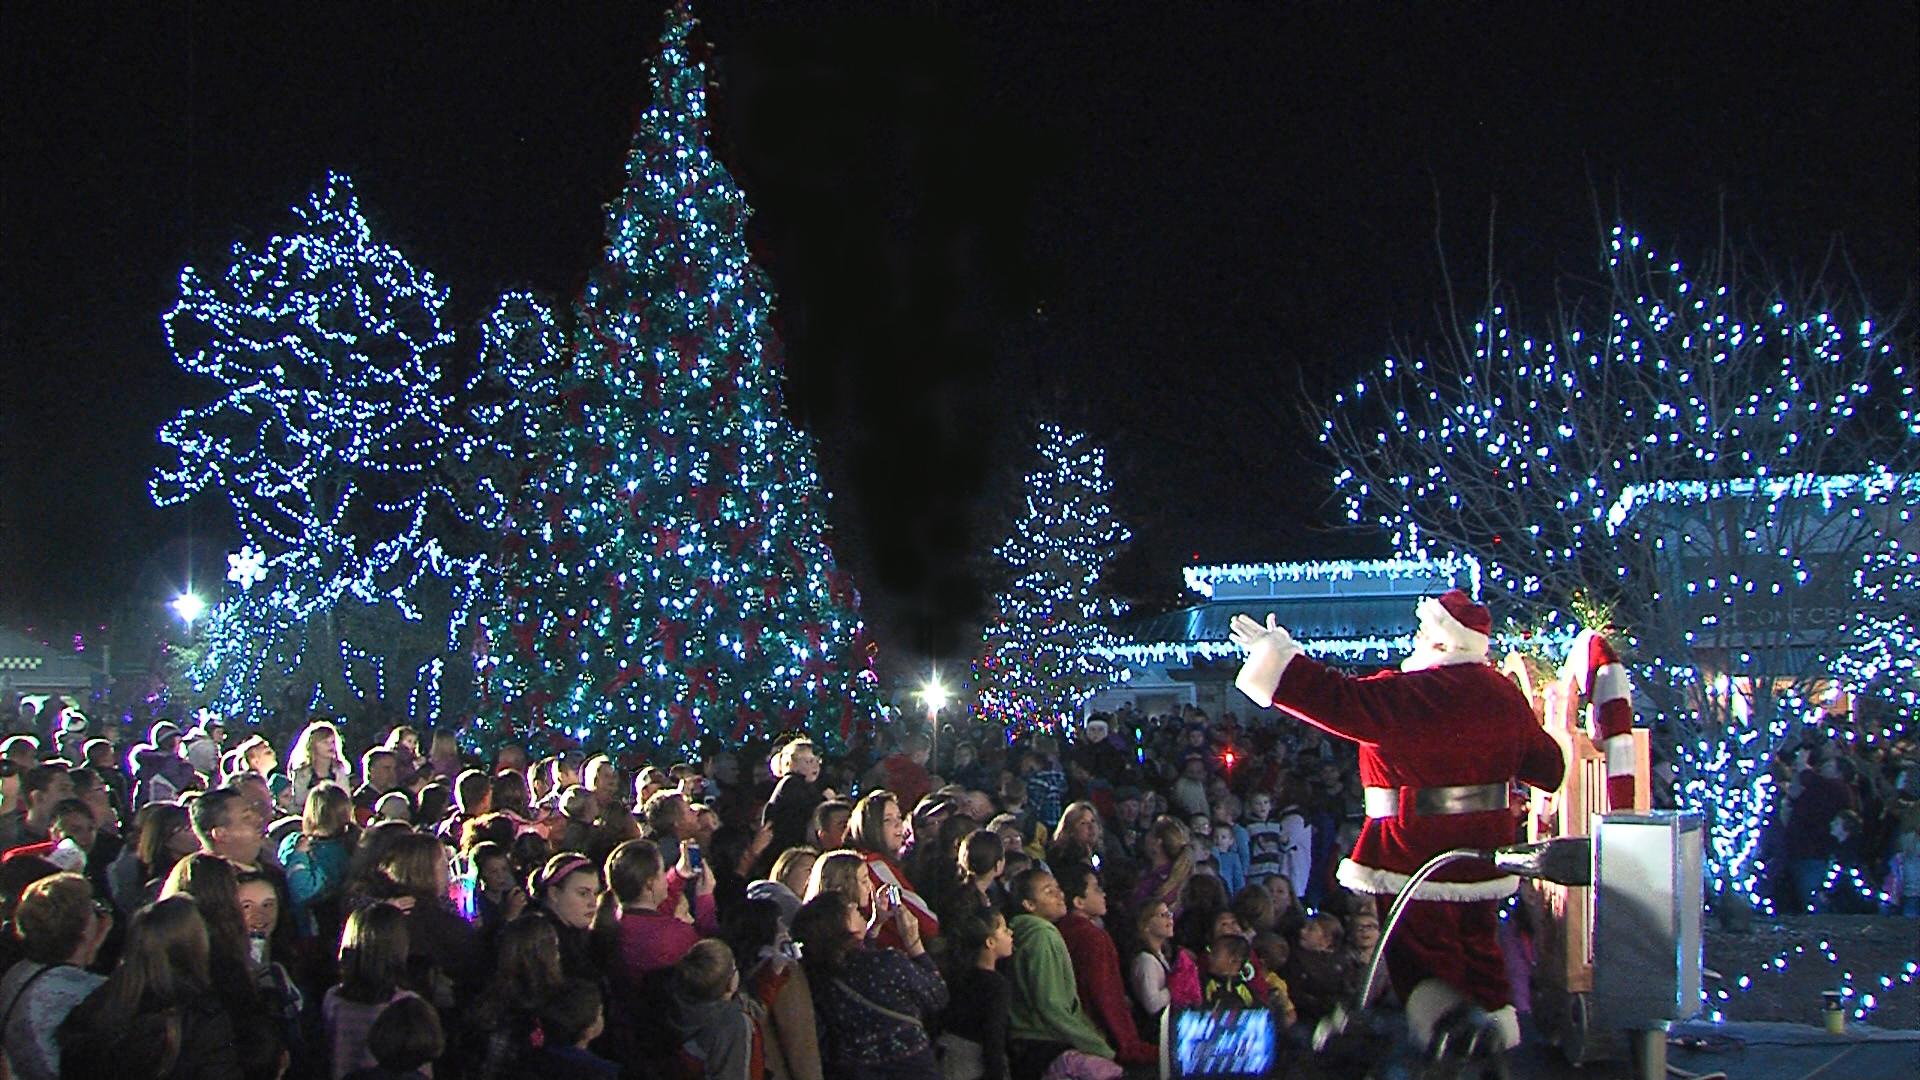 36th Annual PNC Festival of Lights - Cincinnati Zoo